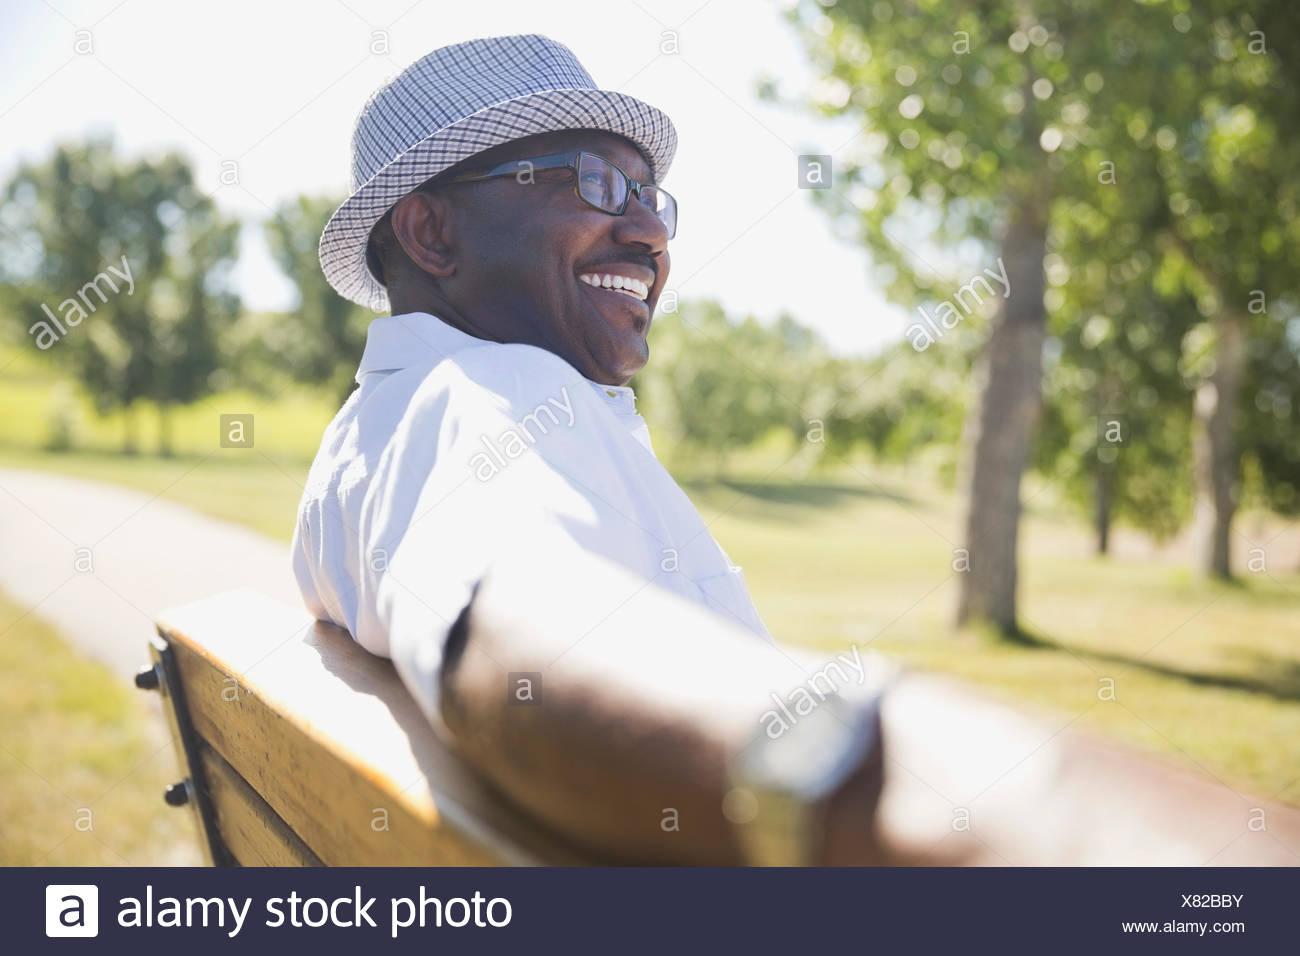 Smiling senior man sitting on park bench - Stock Image